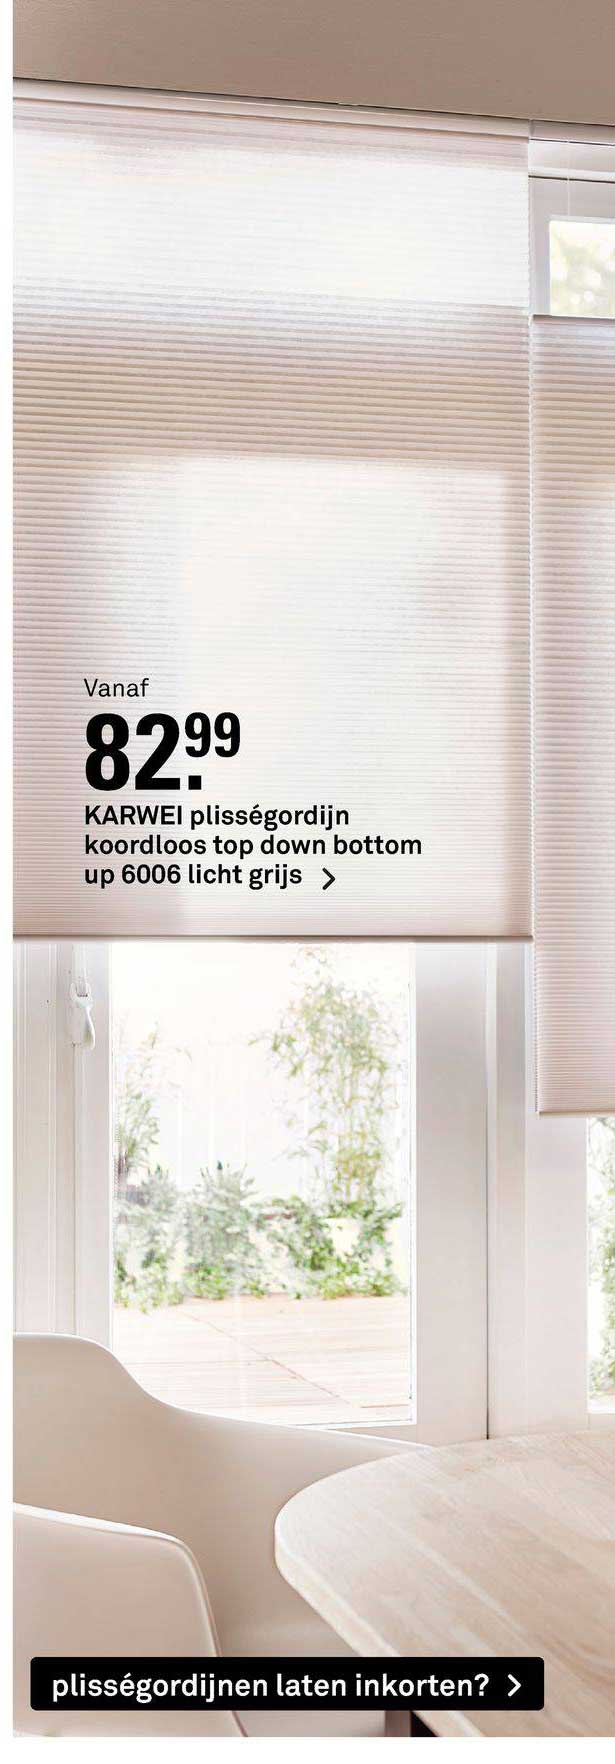 Karwei Karwei Plisségordijn Koordloos Top Down Bottom Up 6006 Licht Grijs